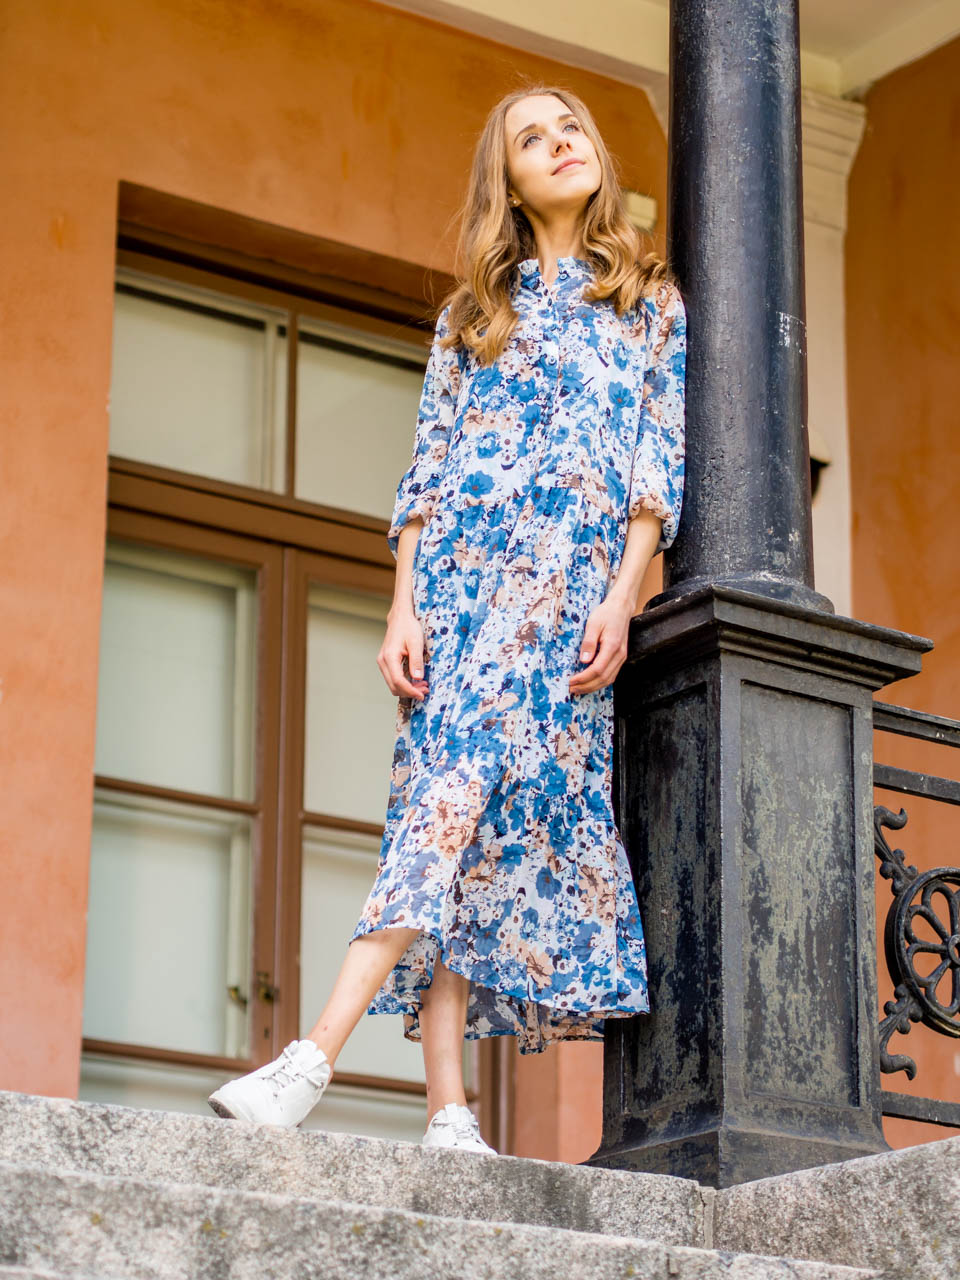 chunky-sneakers-floral-maxi-dress-lenkkarit-kukkamekko-kappahl-ecco